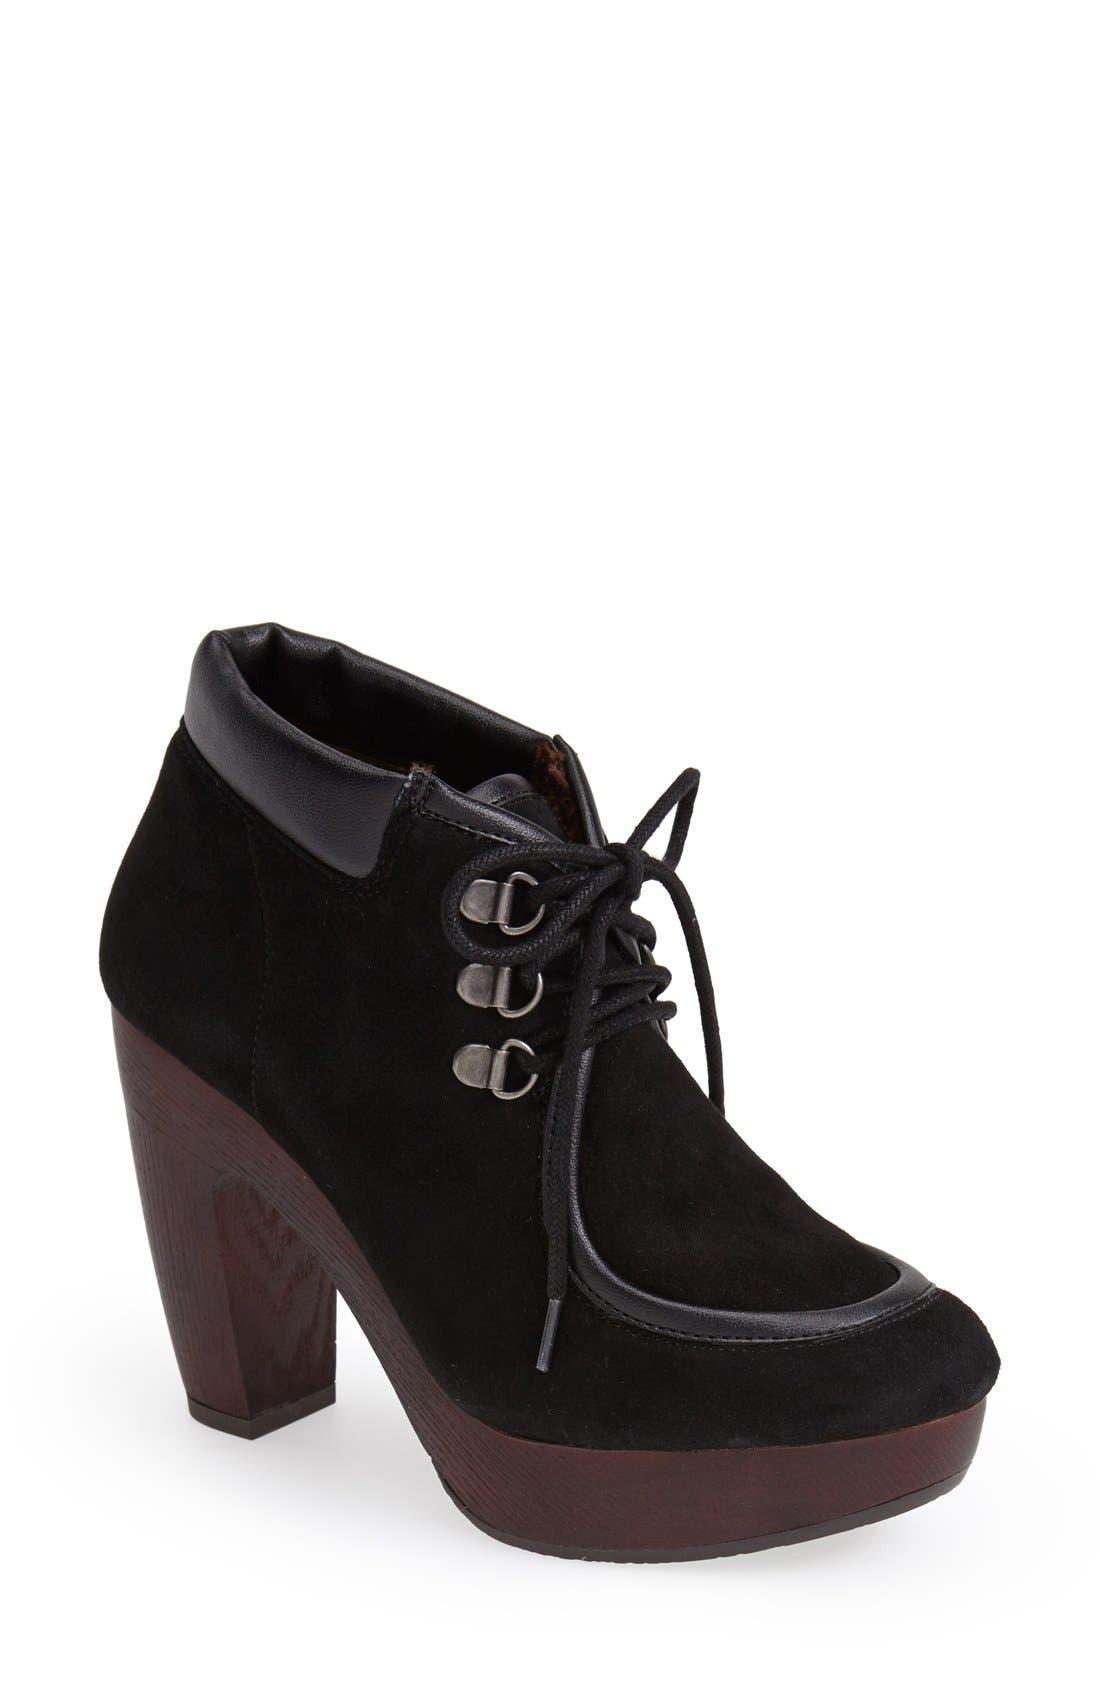 Alternate Image 1 Selected - Lucky Brand 'Cendara' Platform Bootie (Women)